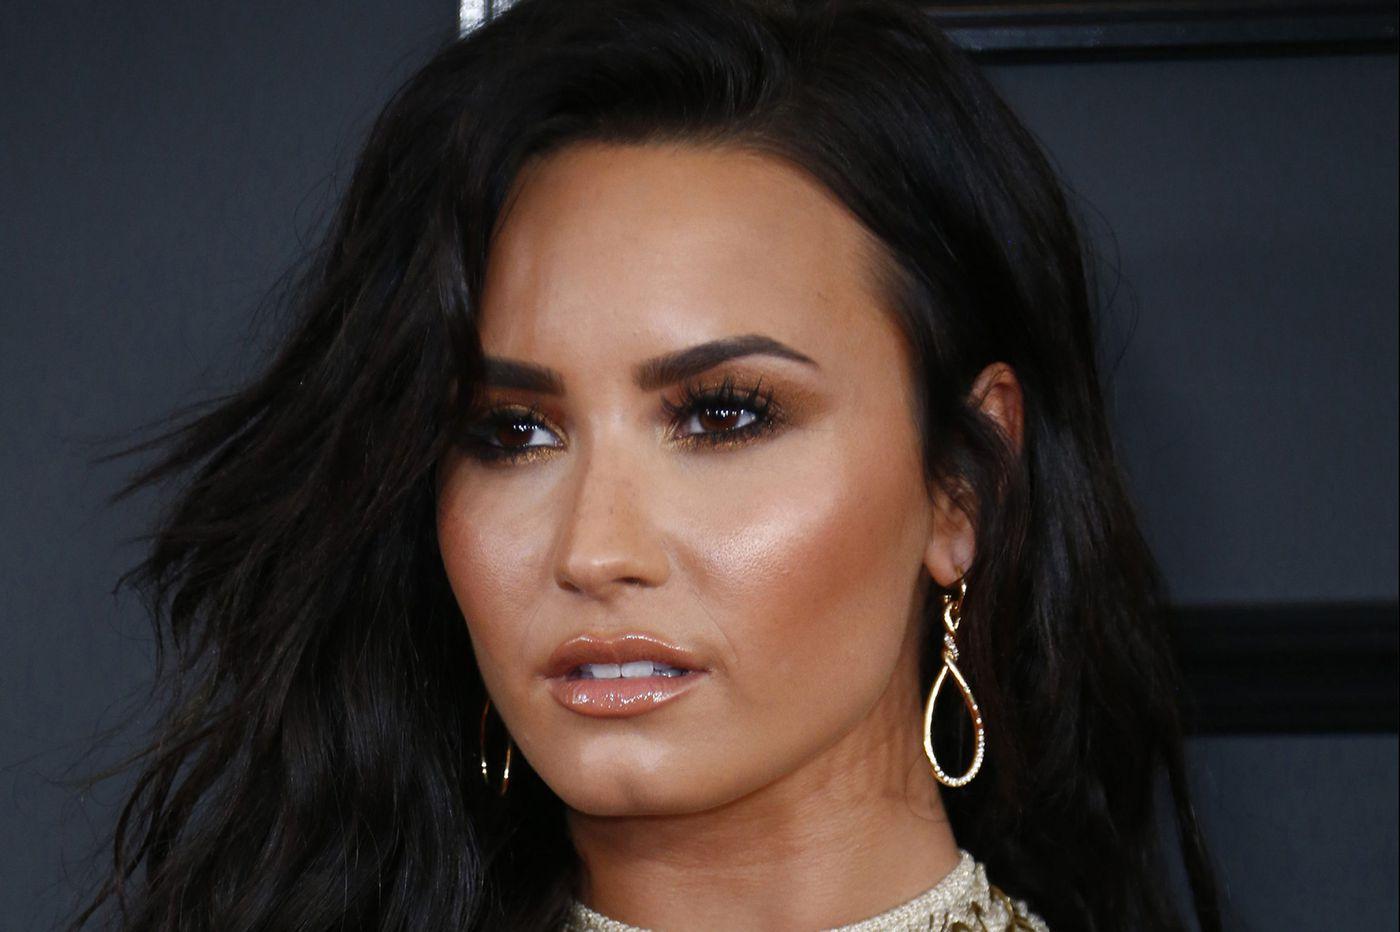 Demi Lovato will no longer headline AC beach concert Thursday, Lauv will still go on